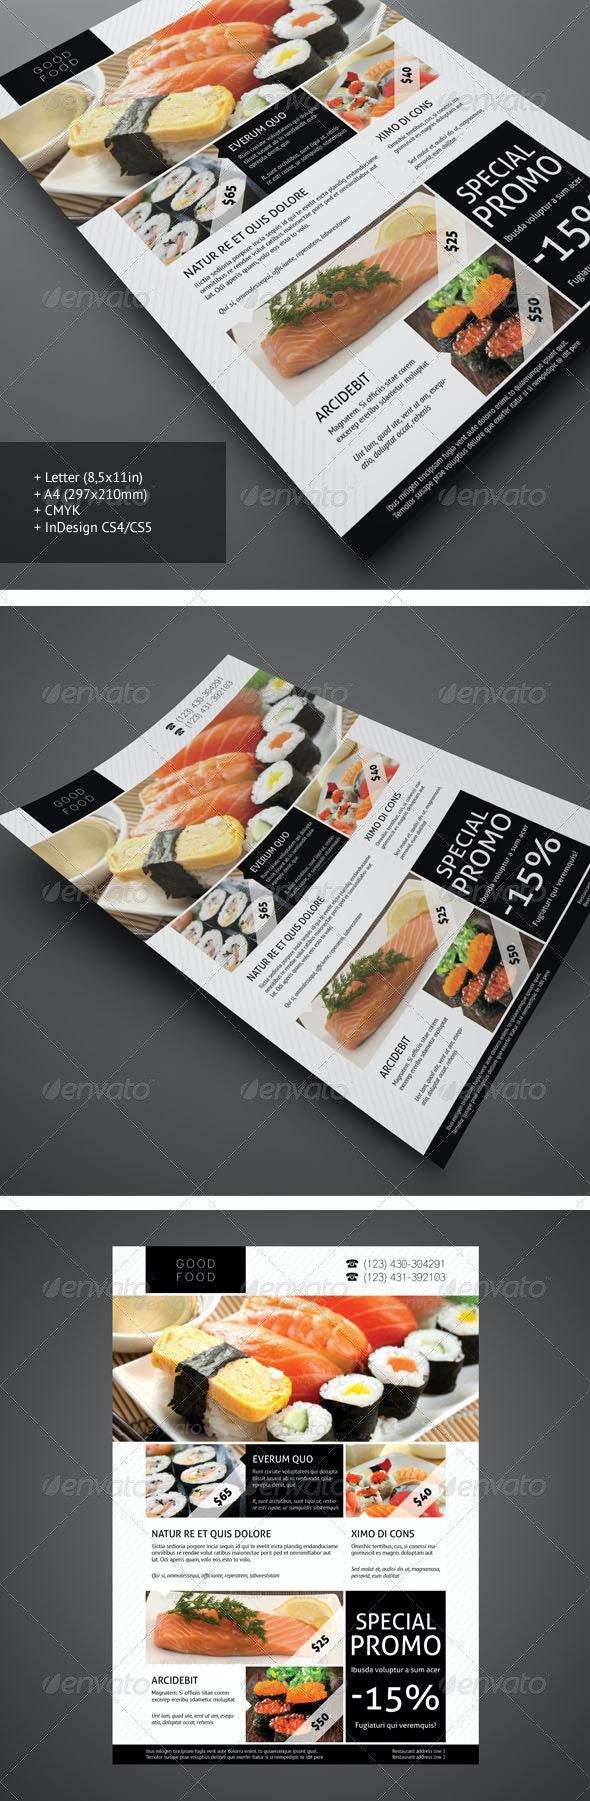 Restaurant Flyer 1 - Restaurant Flyers